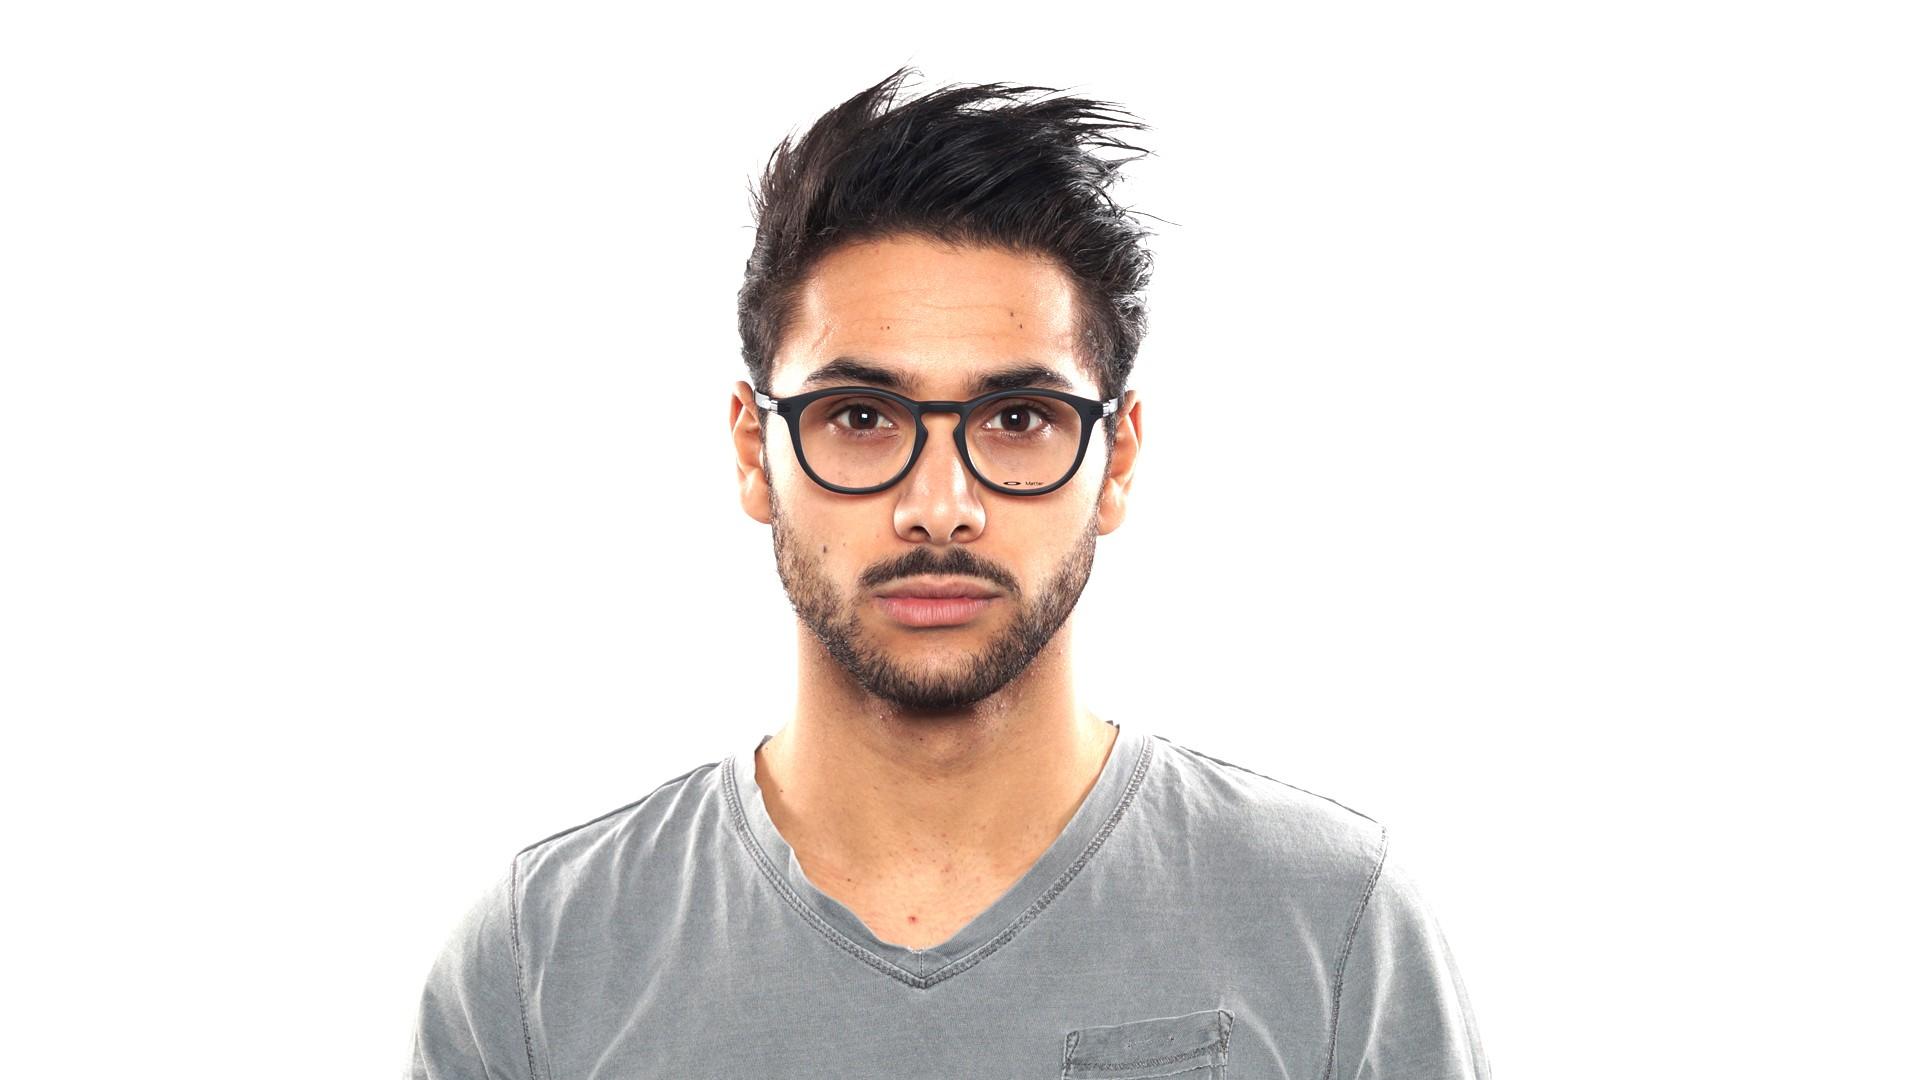 Best Eyeglass Frames For Round Face